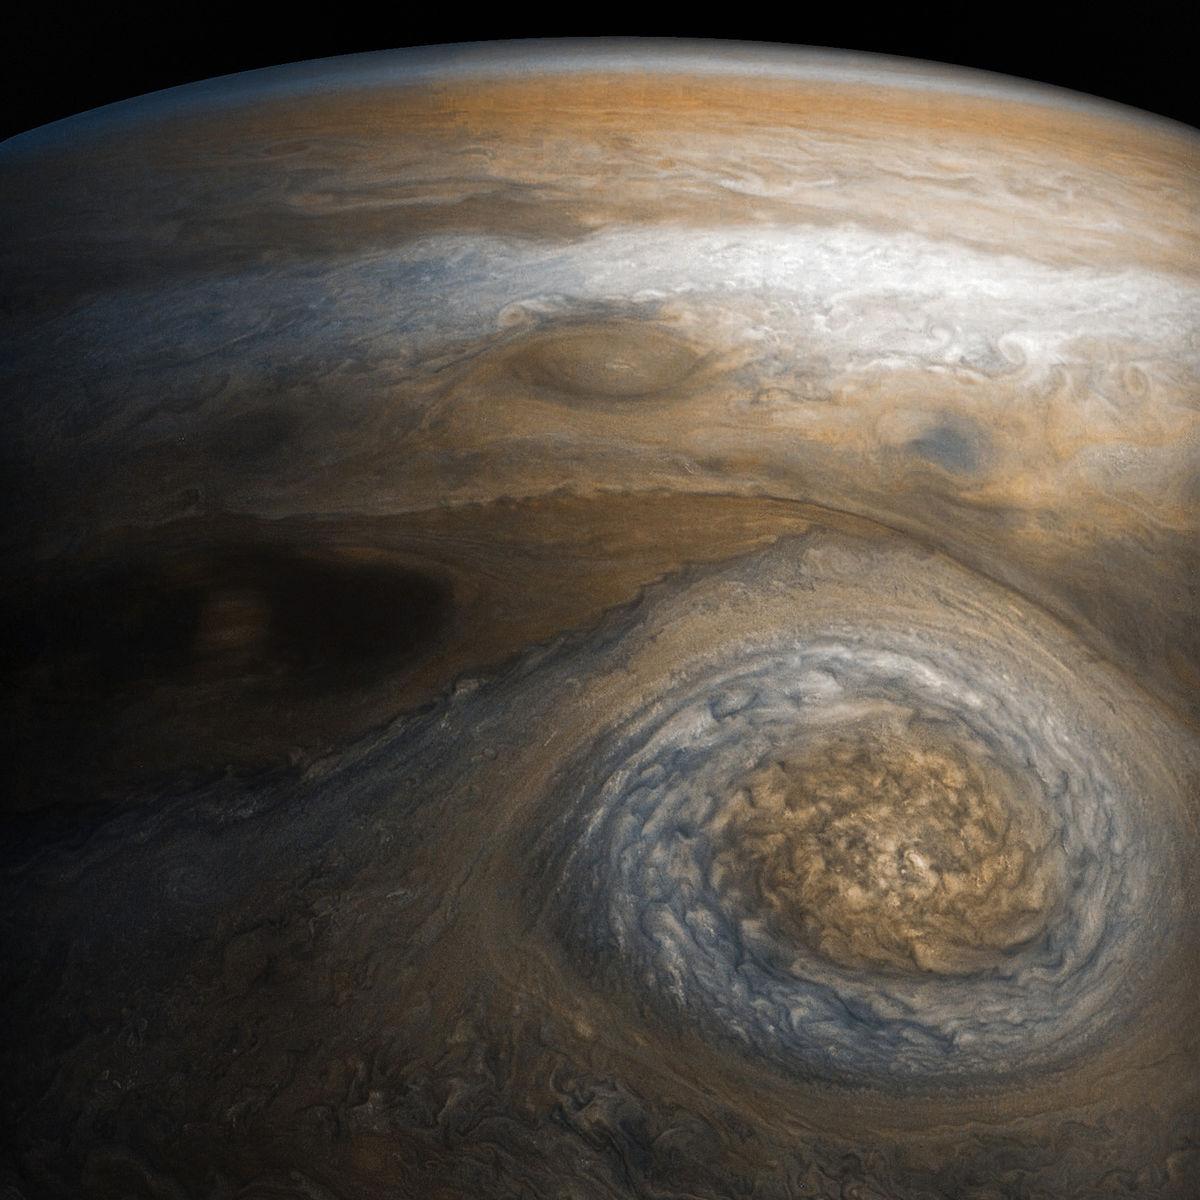 A storm called NN-LRS-1 in Jupiter's northern latitudes, spotted by Juno in July 2017. Credit: NASA/JPL-Caltech/SwRI/MSSS/Gerald Eichstädt/Seán Doran